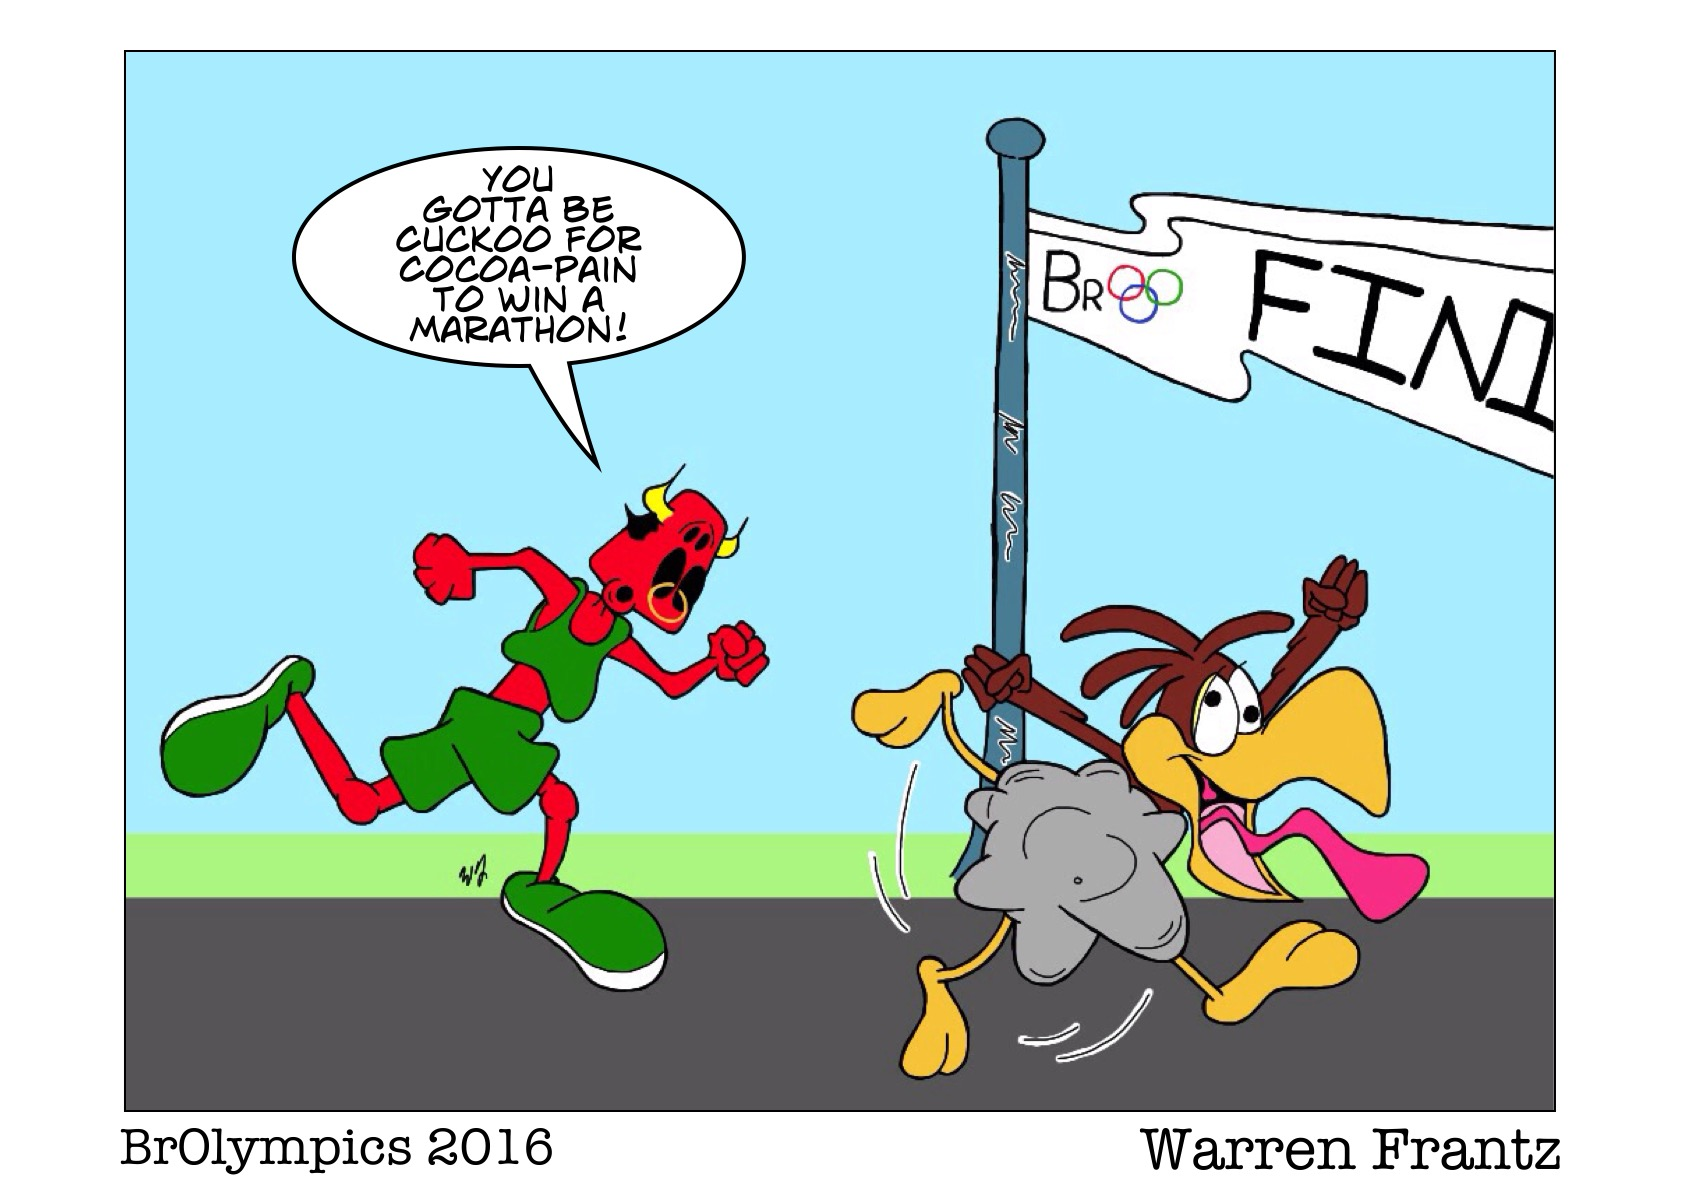 BrOlympics Marathon